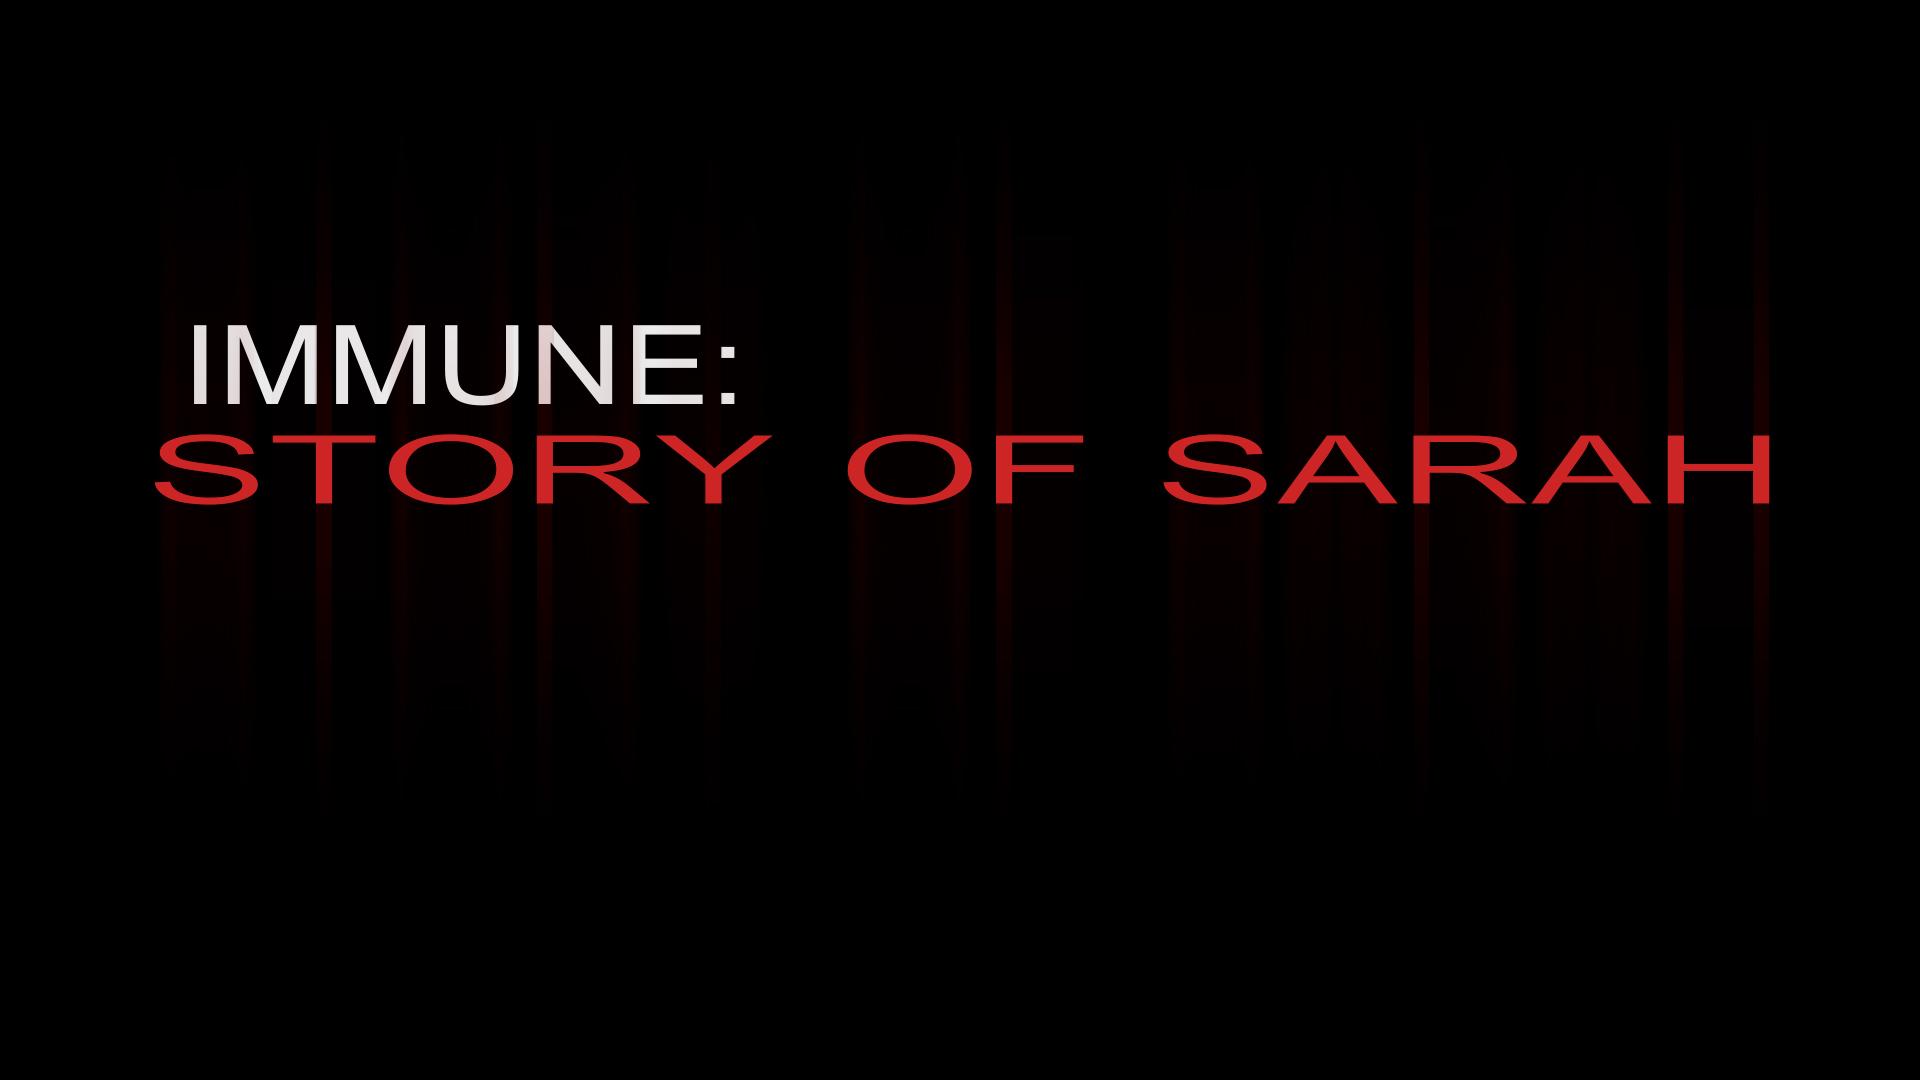 Immune: Story Of Sarah